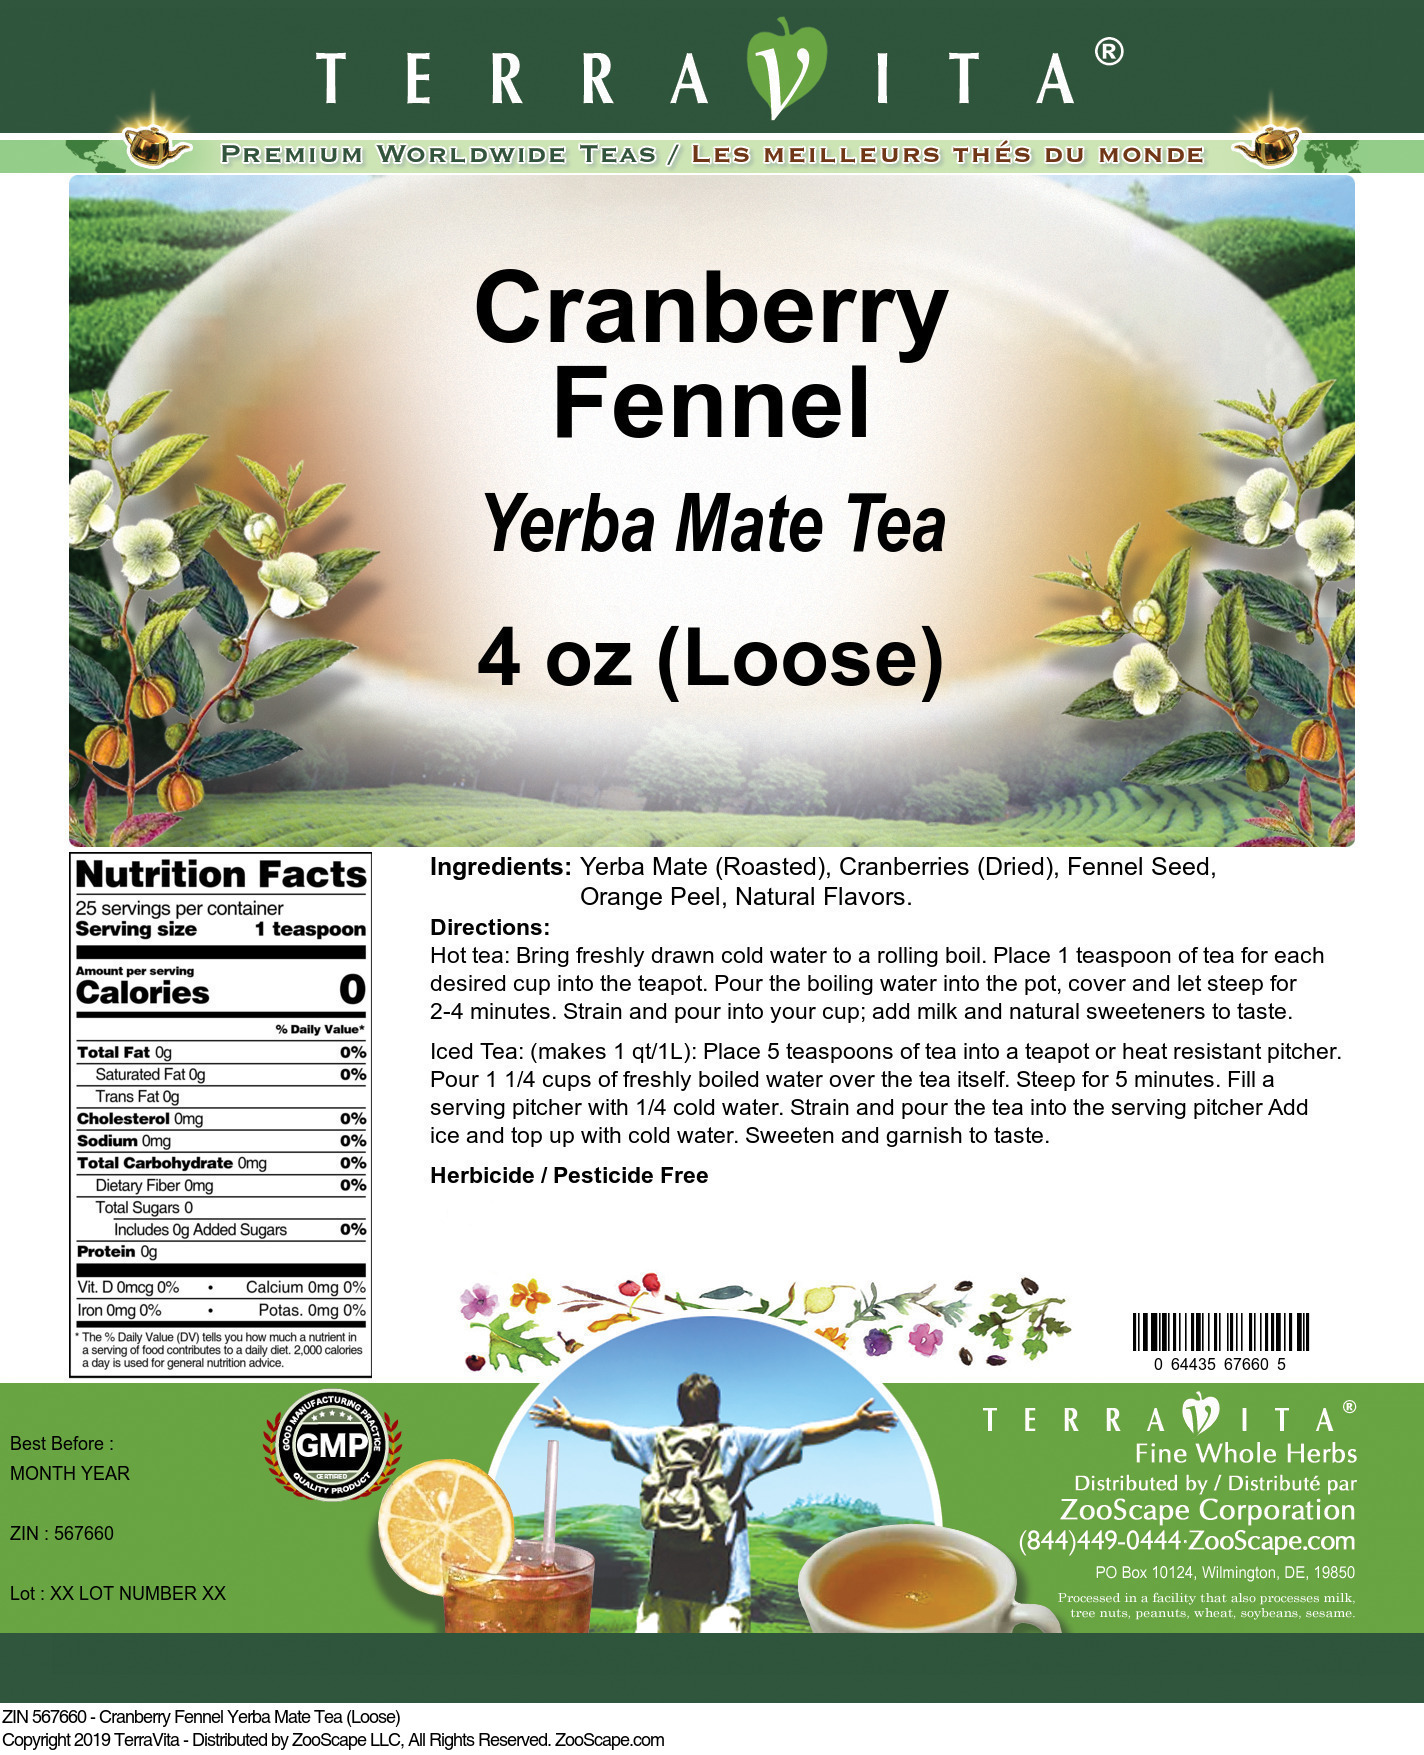 Cranberry Fennel Yerba Mate